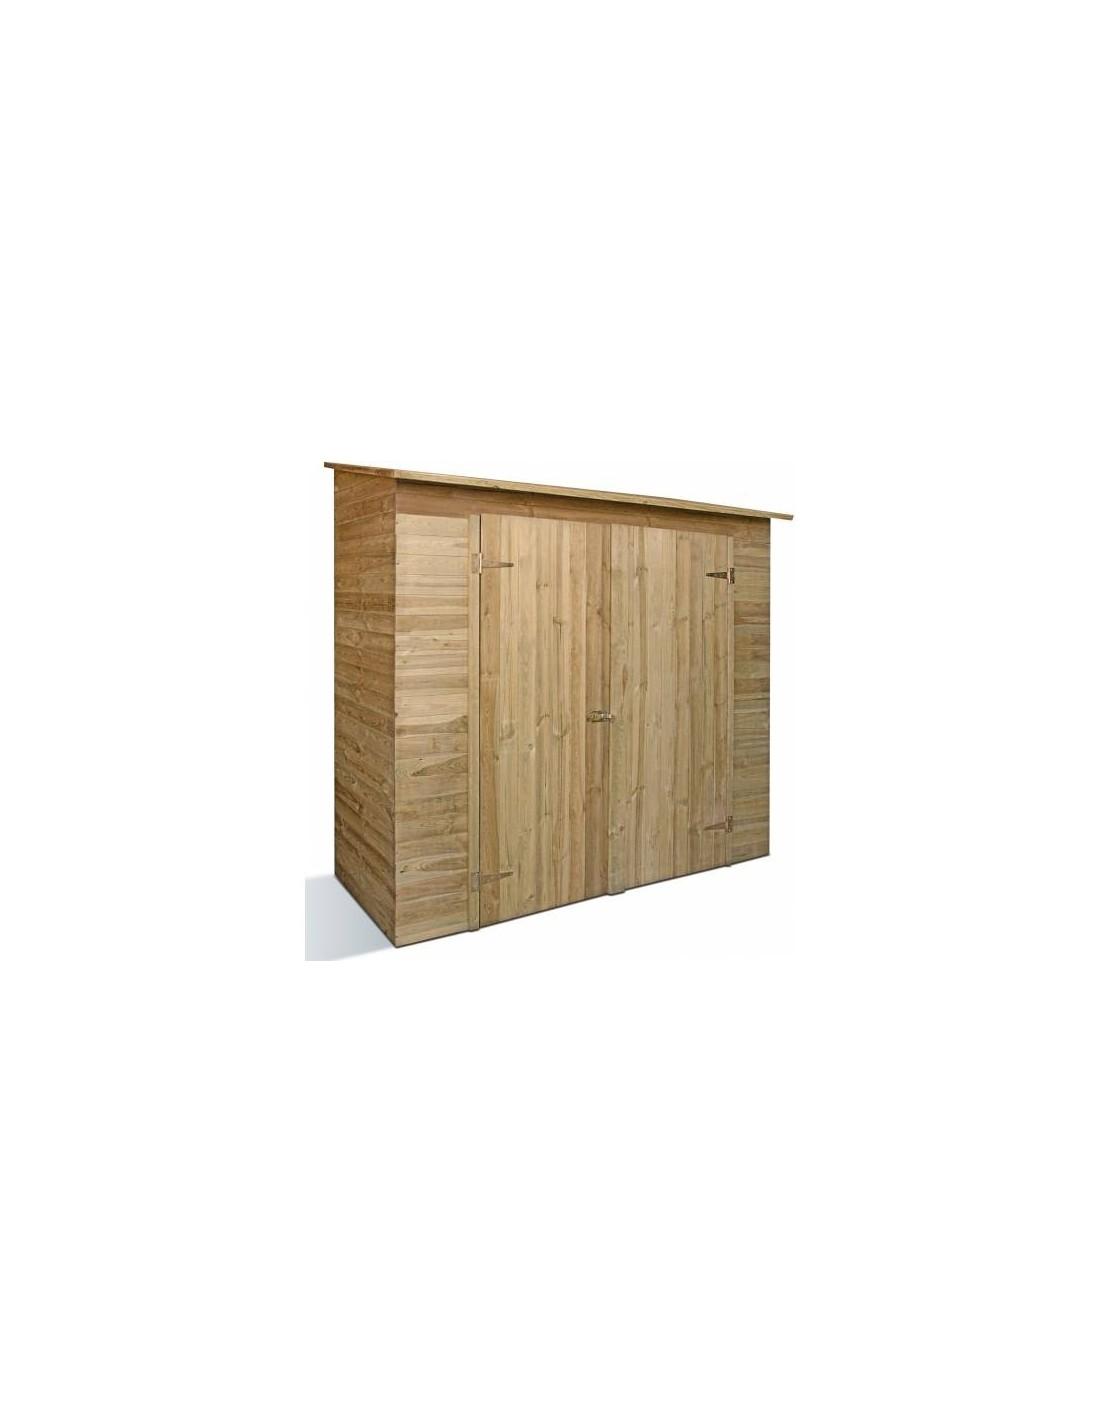 armoire murale savona jardipolys bois trait autoclave. Black Bedroom Furniture Sets. Home Design Ideas